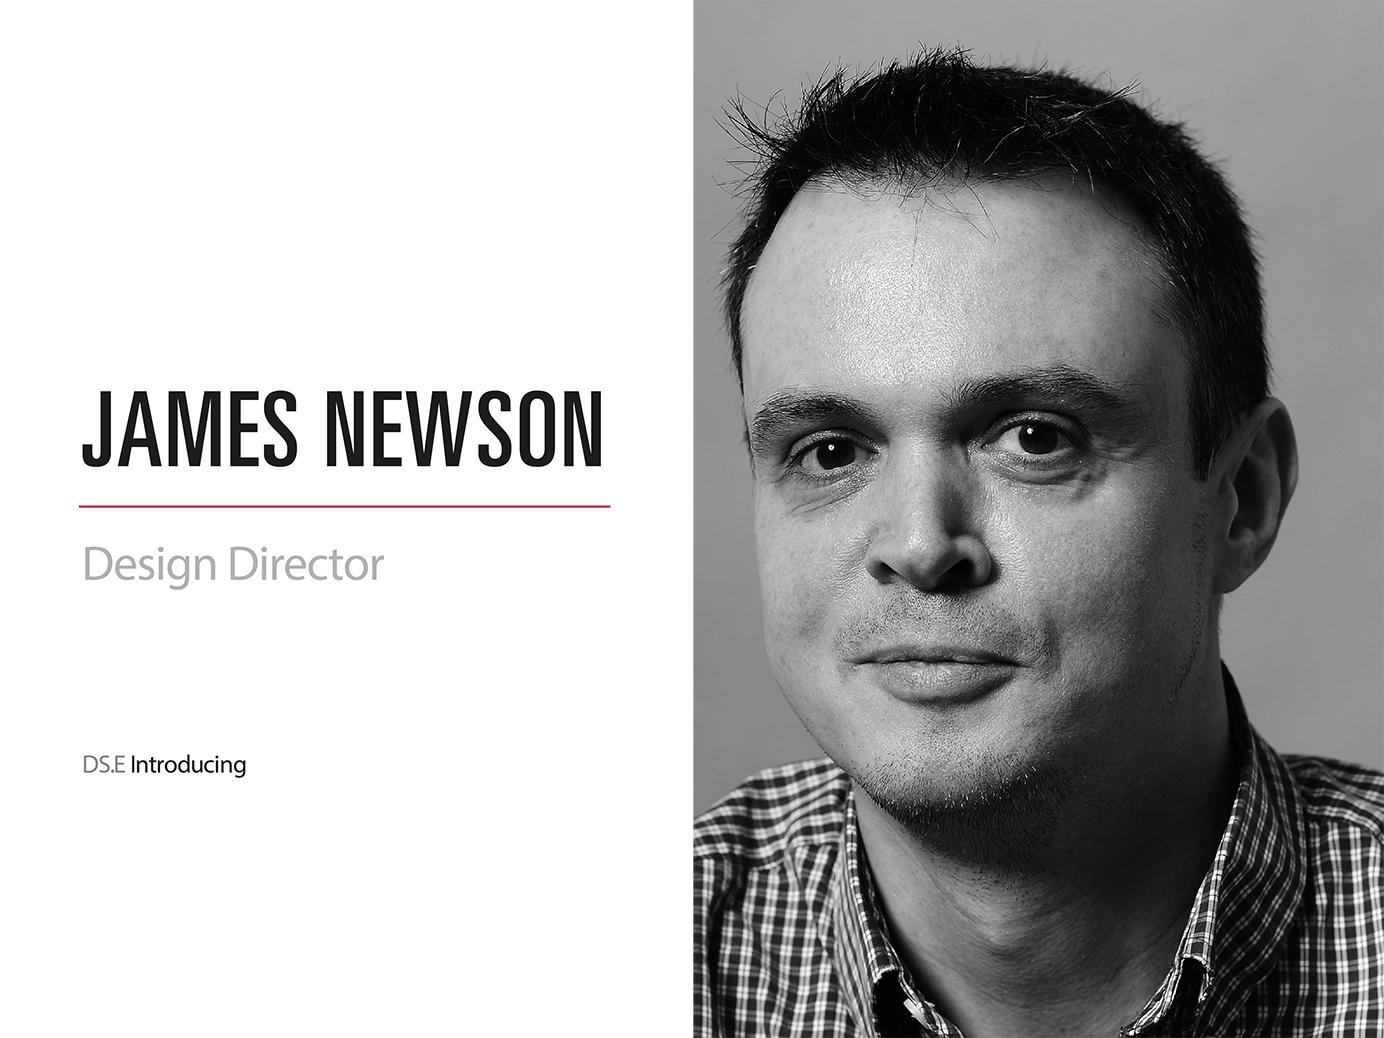 James Newson